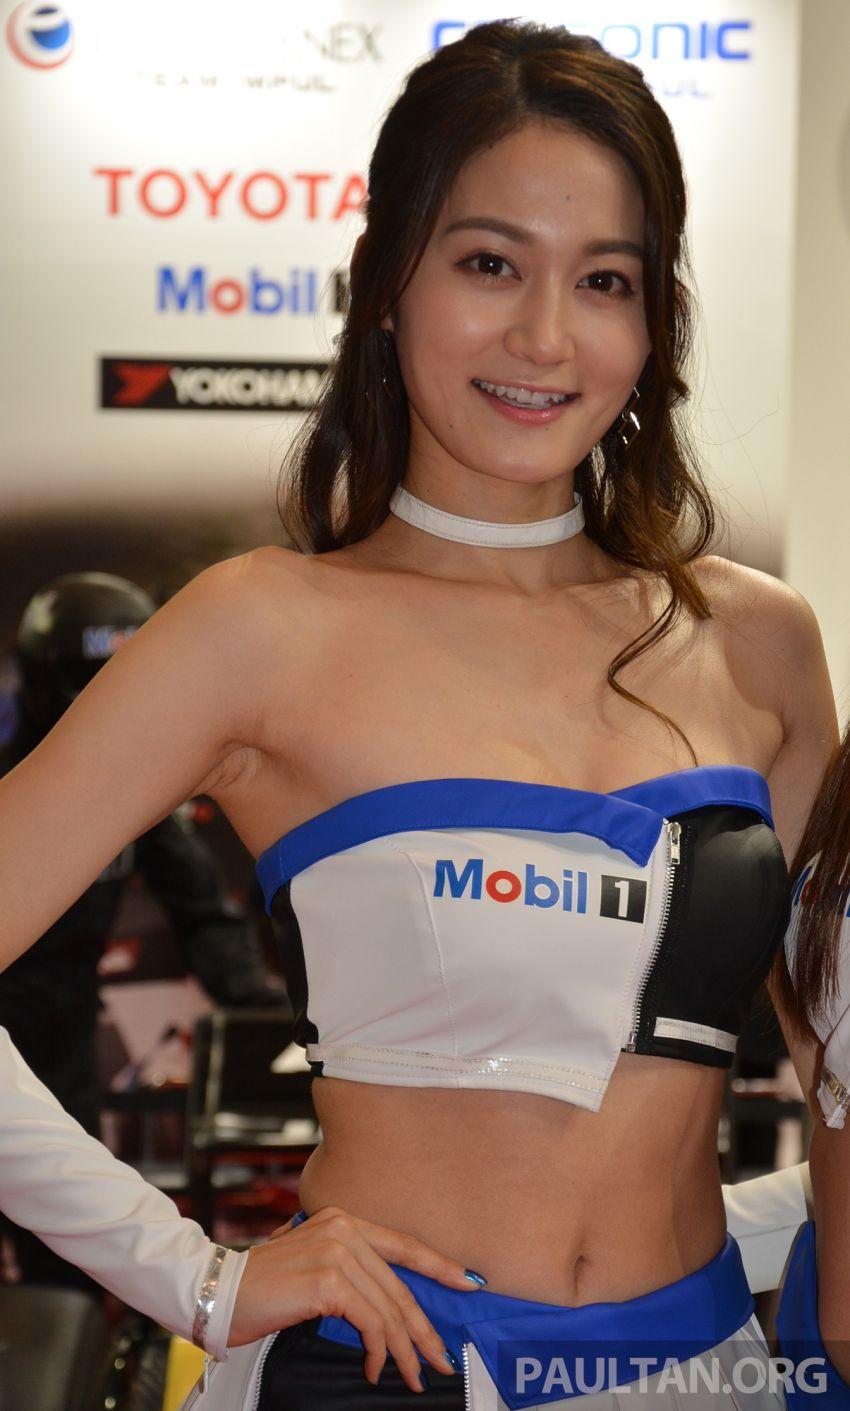 TAS 2019: <em>Kawaii</em> showgirls wrap up our mega inaugural Tokyo Auto Salon live coverage Image #916363